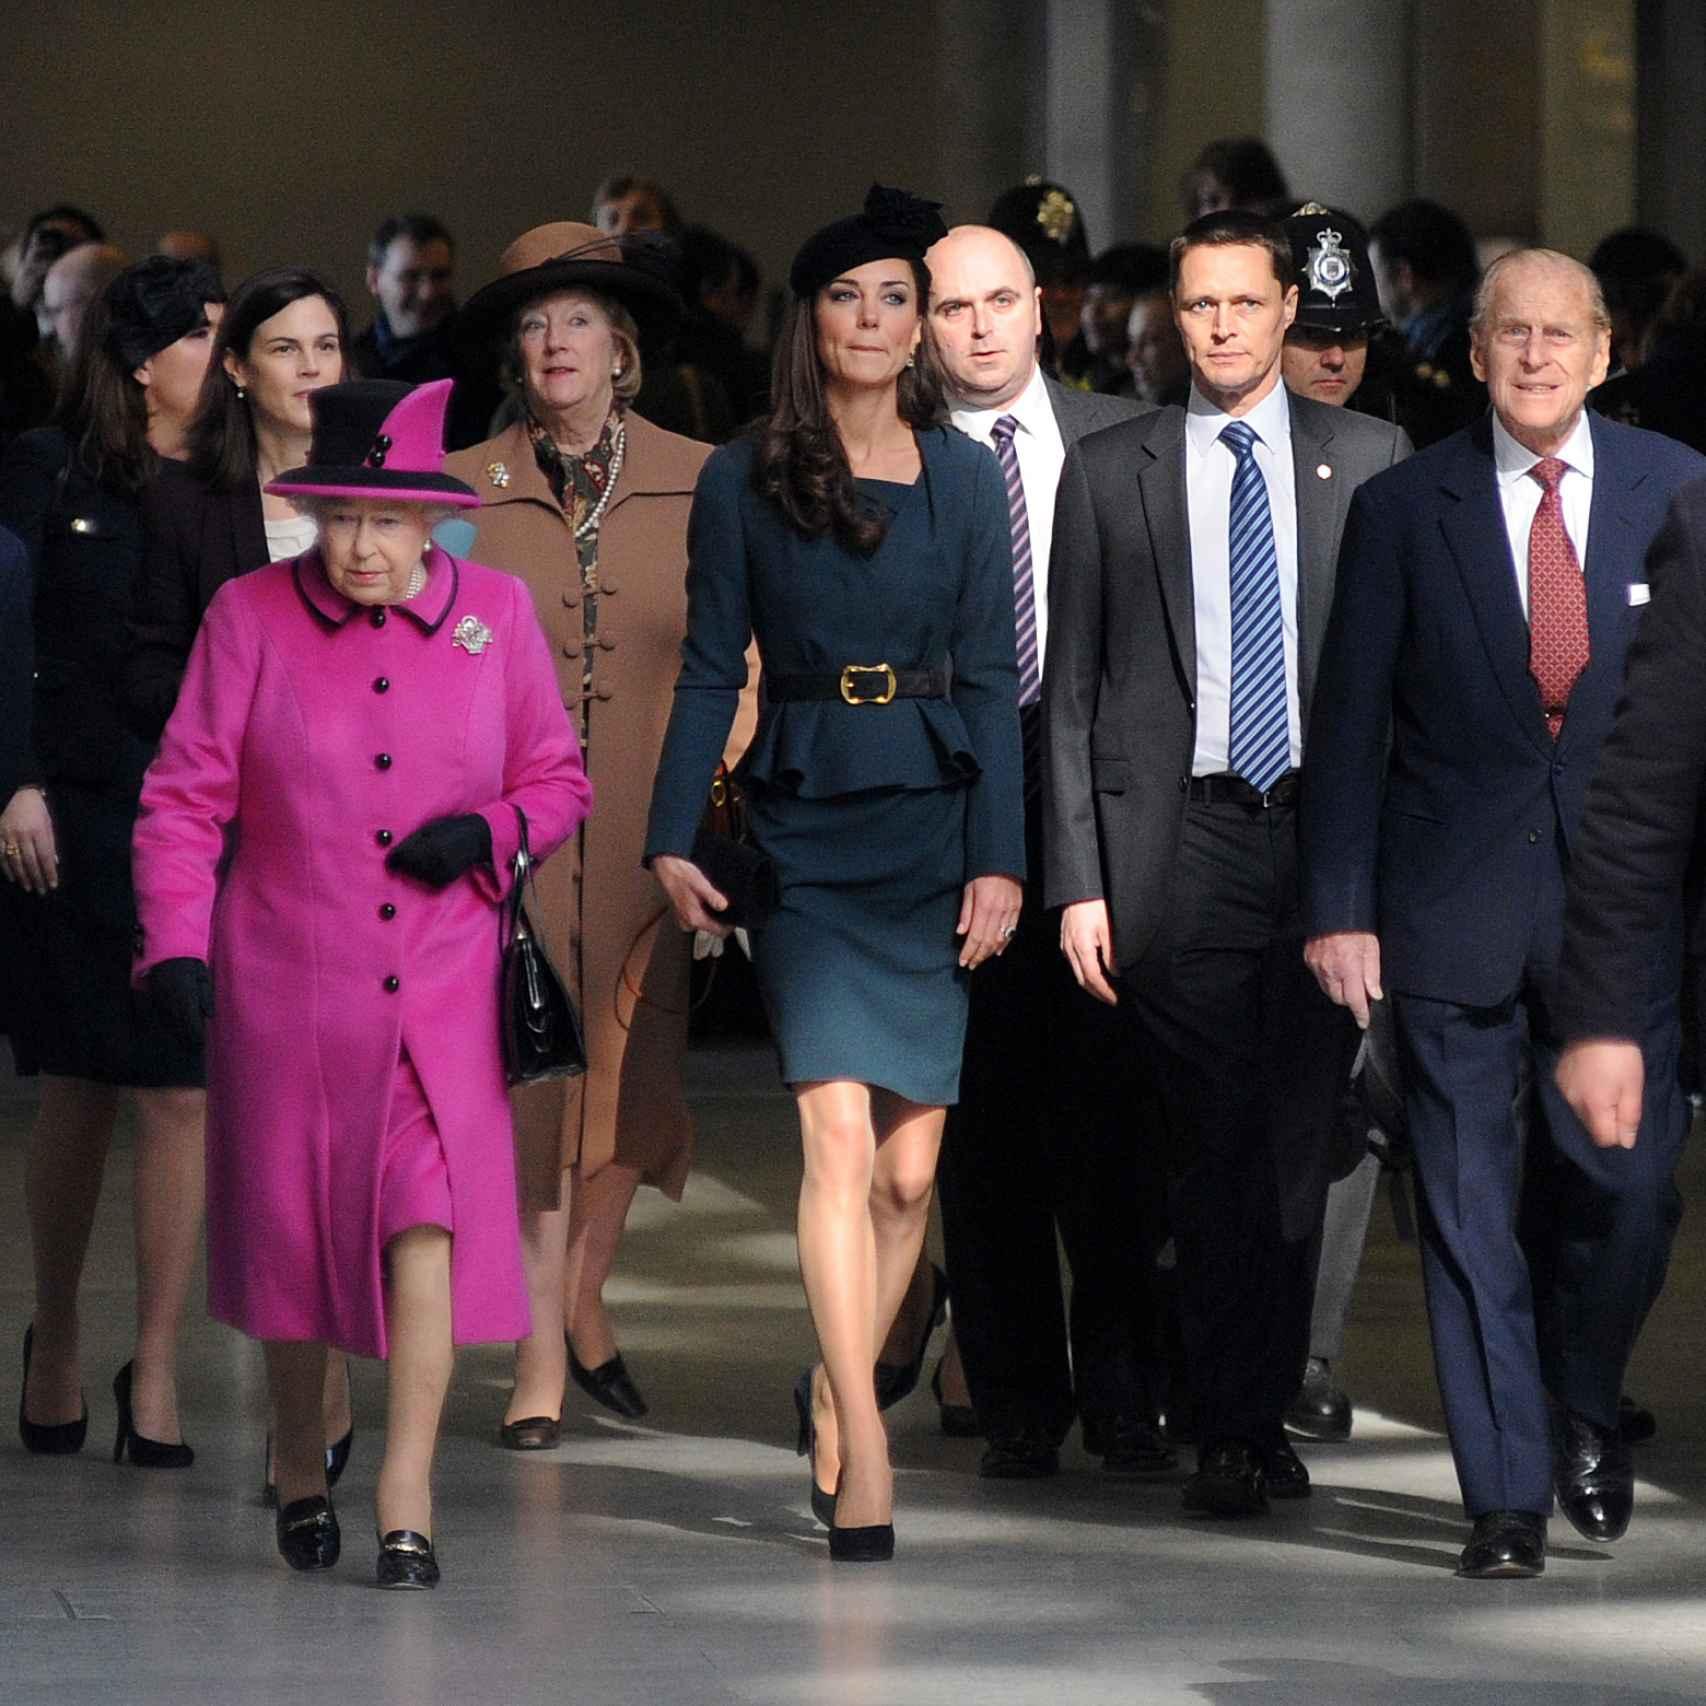 Isabel II, Kate Middleton y Felipe de Edimburgo en Felipe de Edimburgo en Leicester